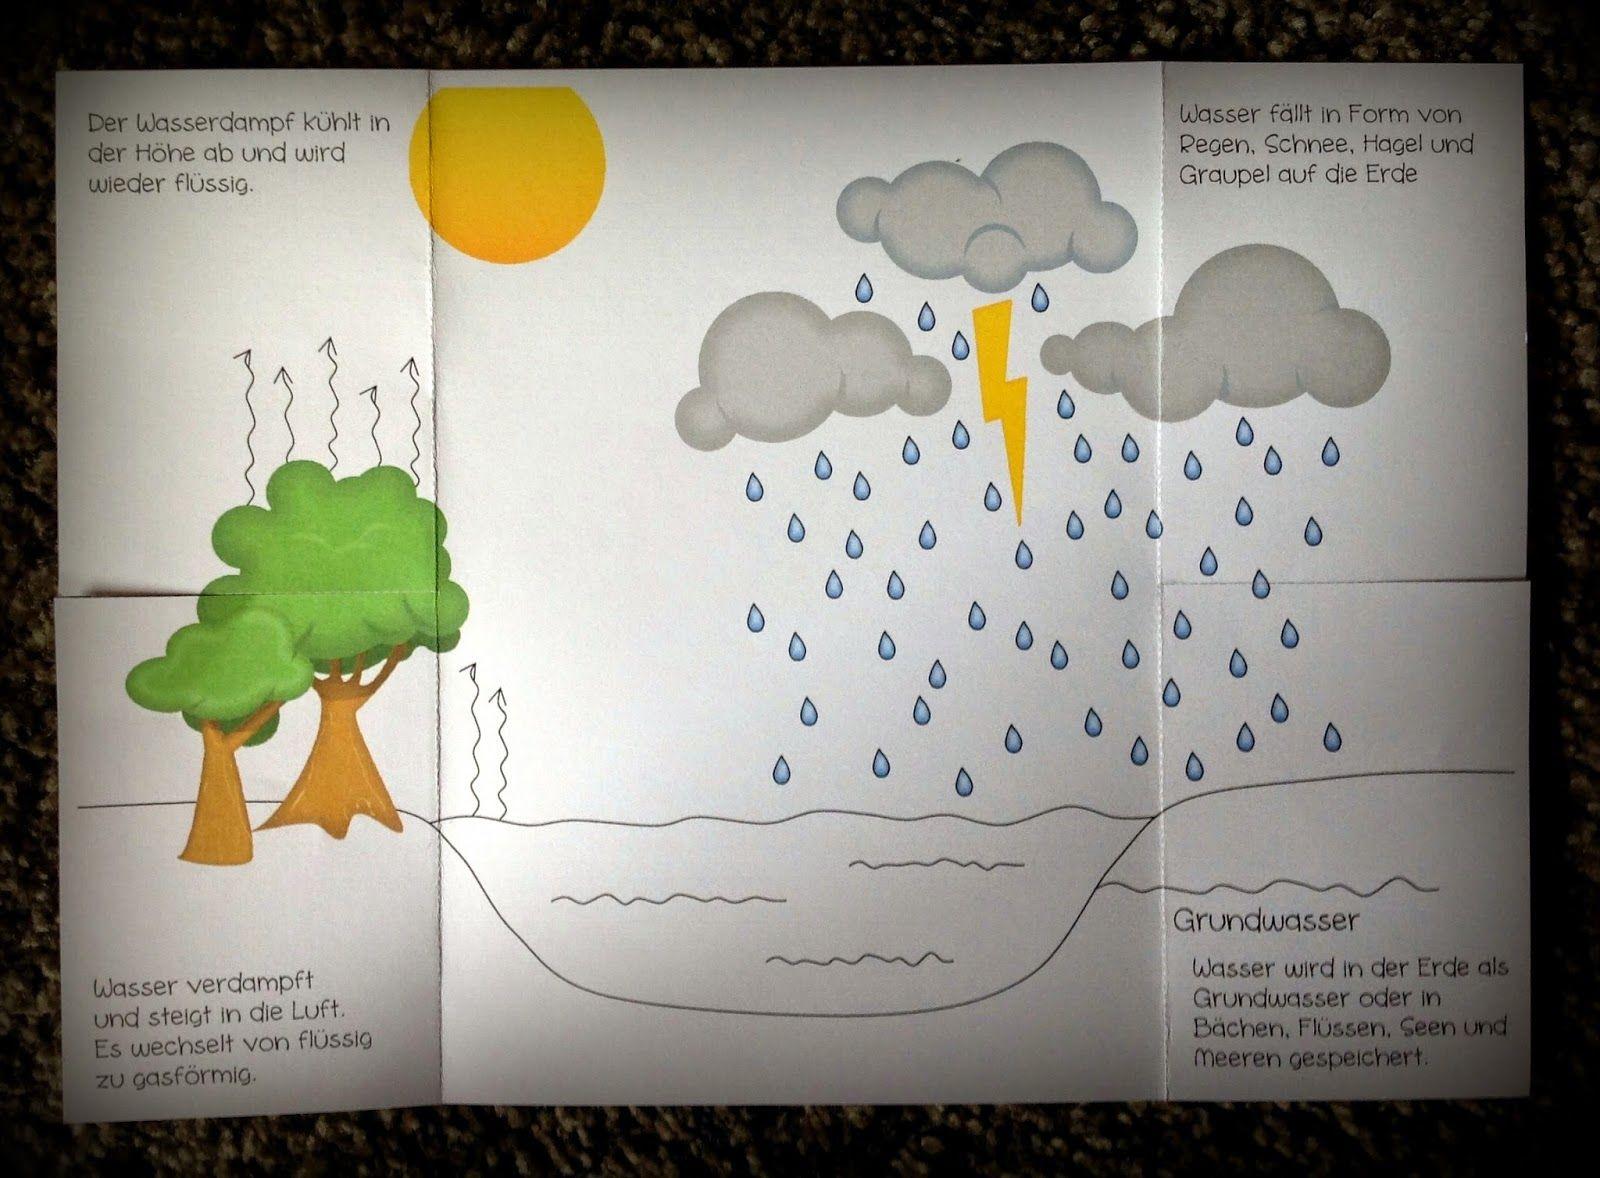 Grundschule Material kostenlos Arbeitsblätter | bimbe | Pinterest ...